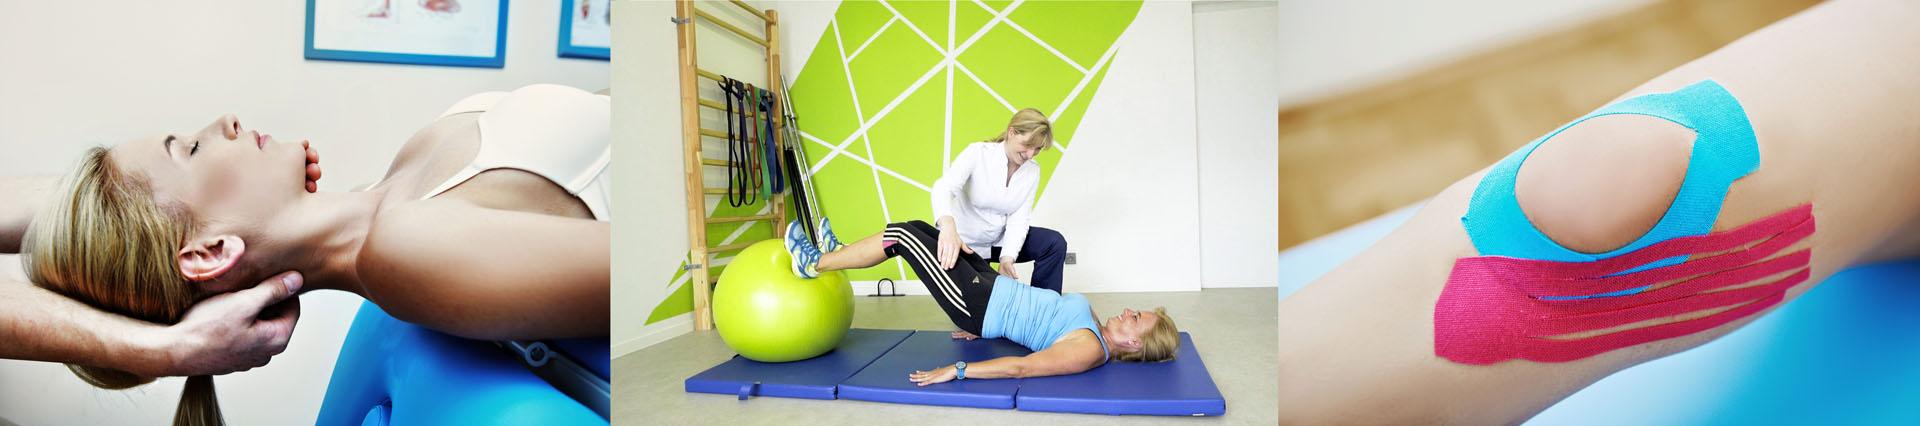 kinesia krakow rehabilitacja